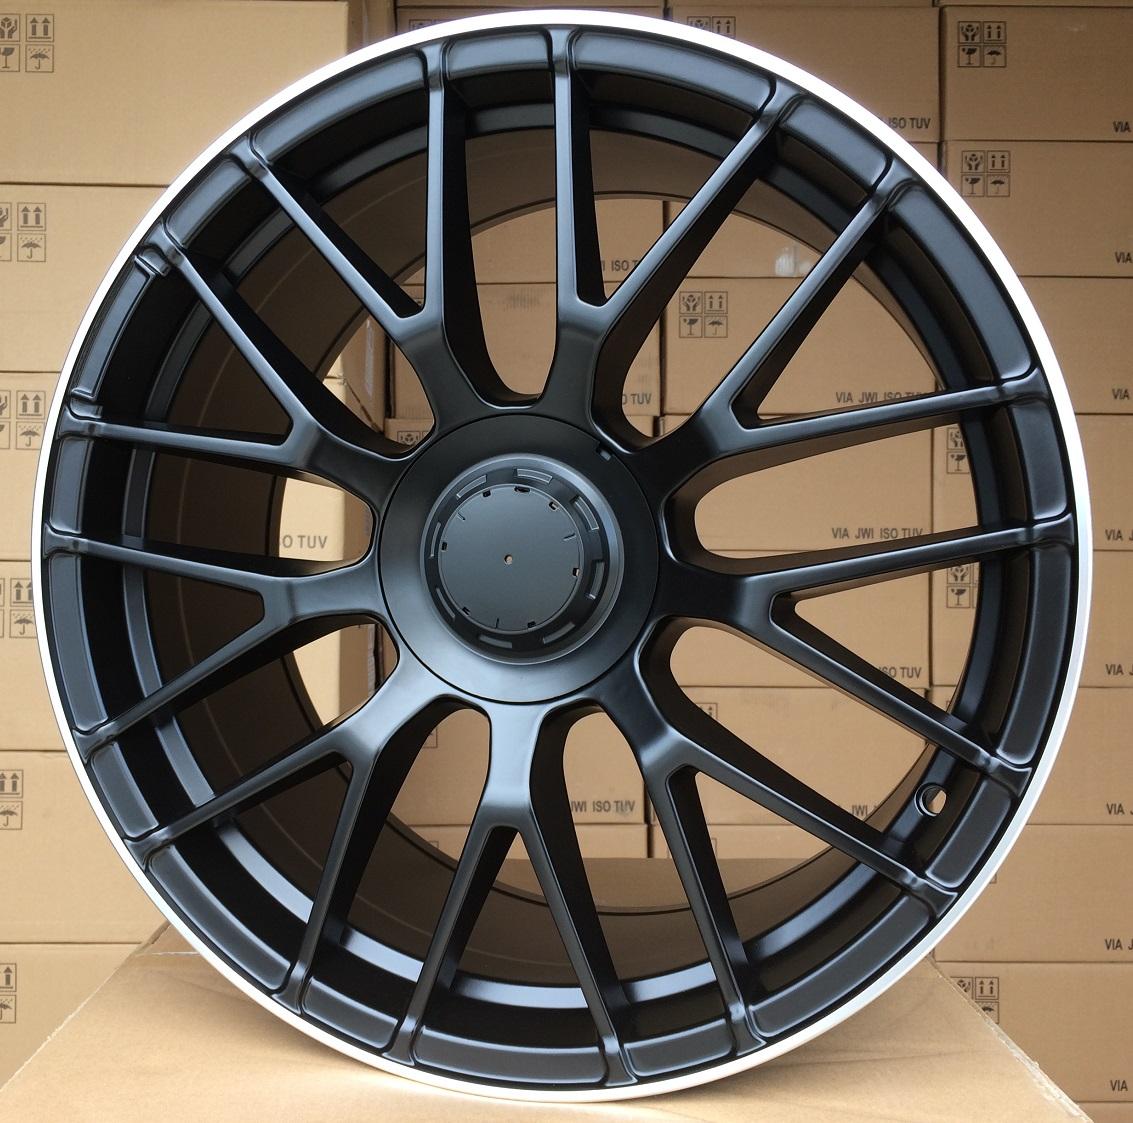 M20X8.5 5X112 ET38 66.6 BK912 (A965) Black half matt + polished lip (Rear+Front) RWR MER (P)## 8.5x20 ET38 5x112